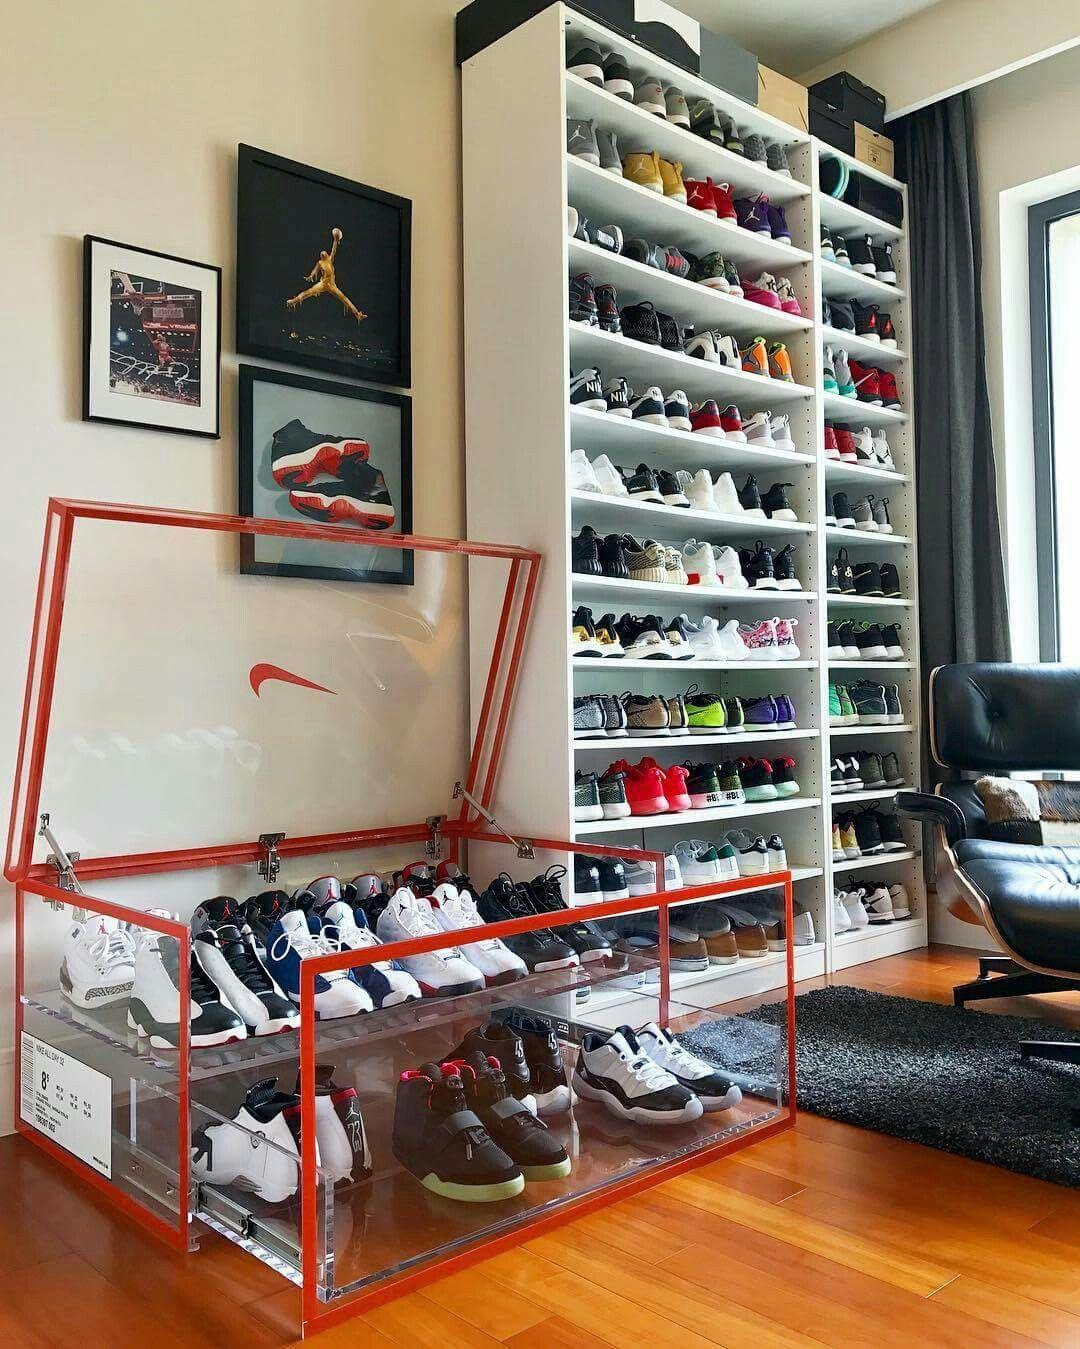 Sneakerhead room, Hypebeast room, Shoe room